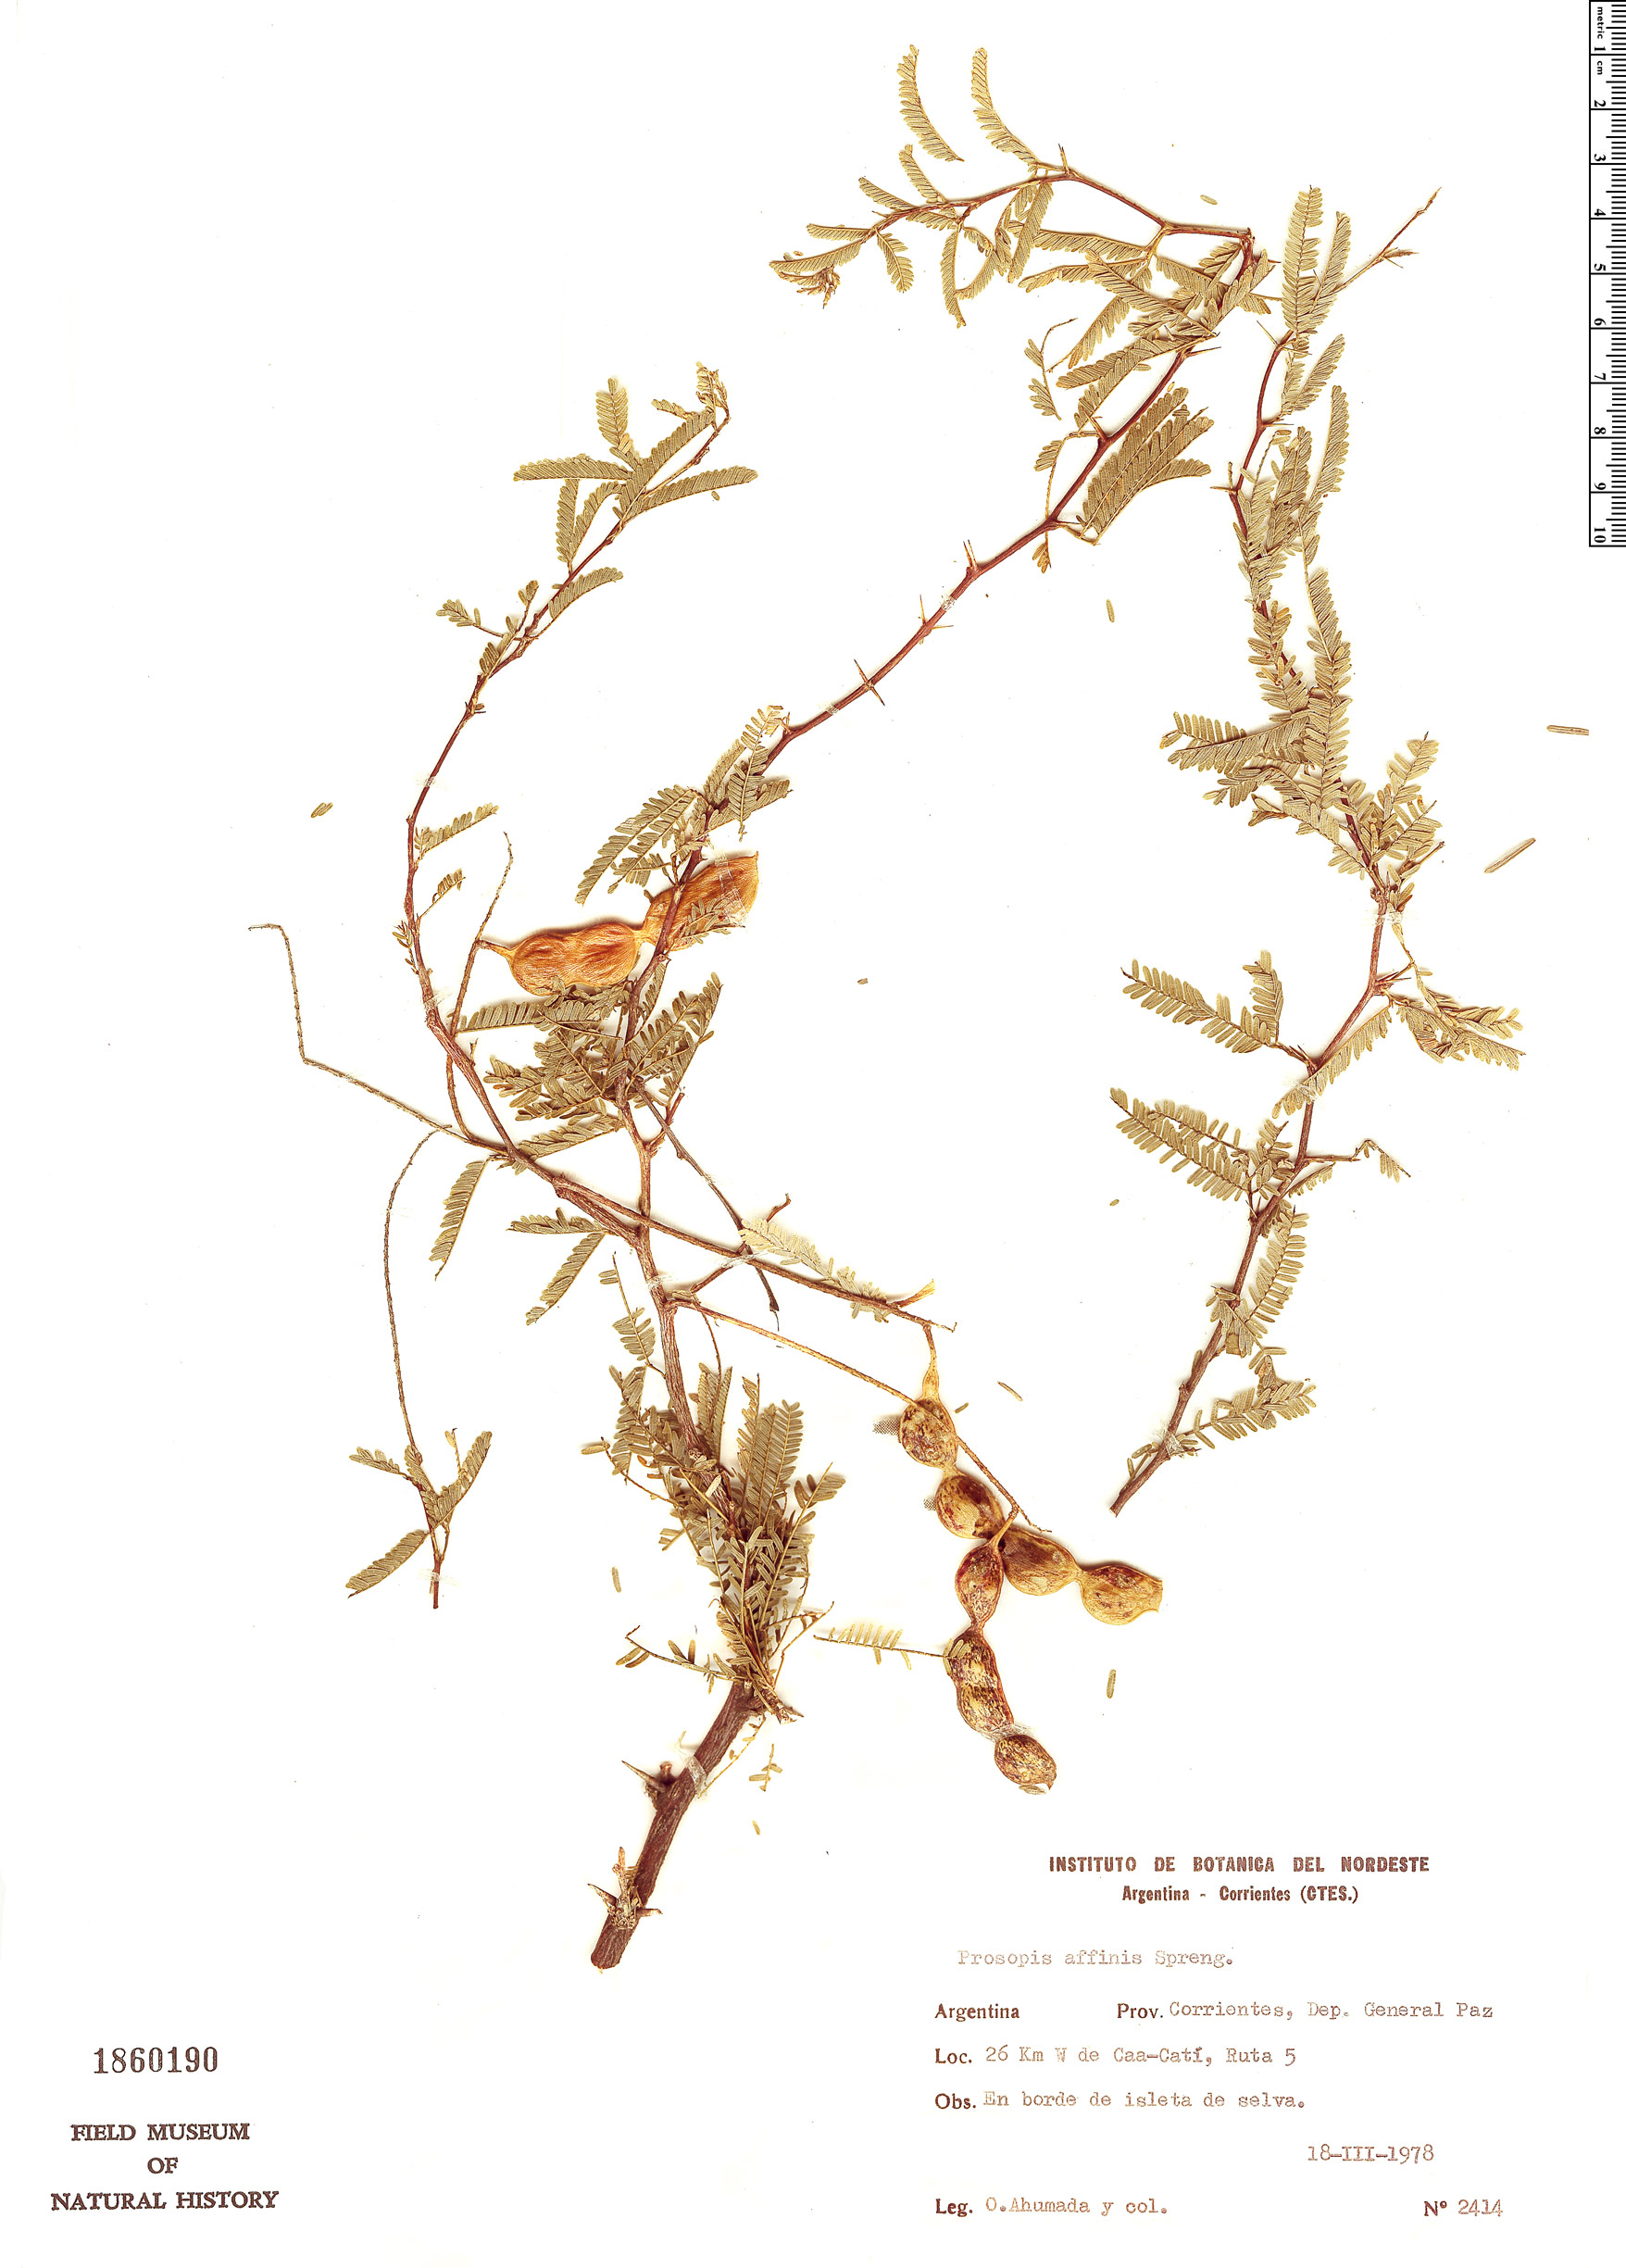 Specimen: Prosopis affinis